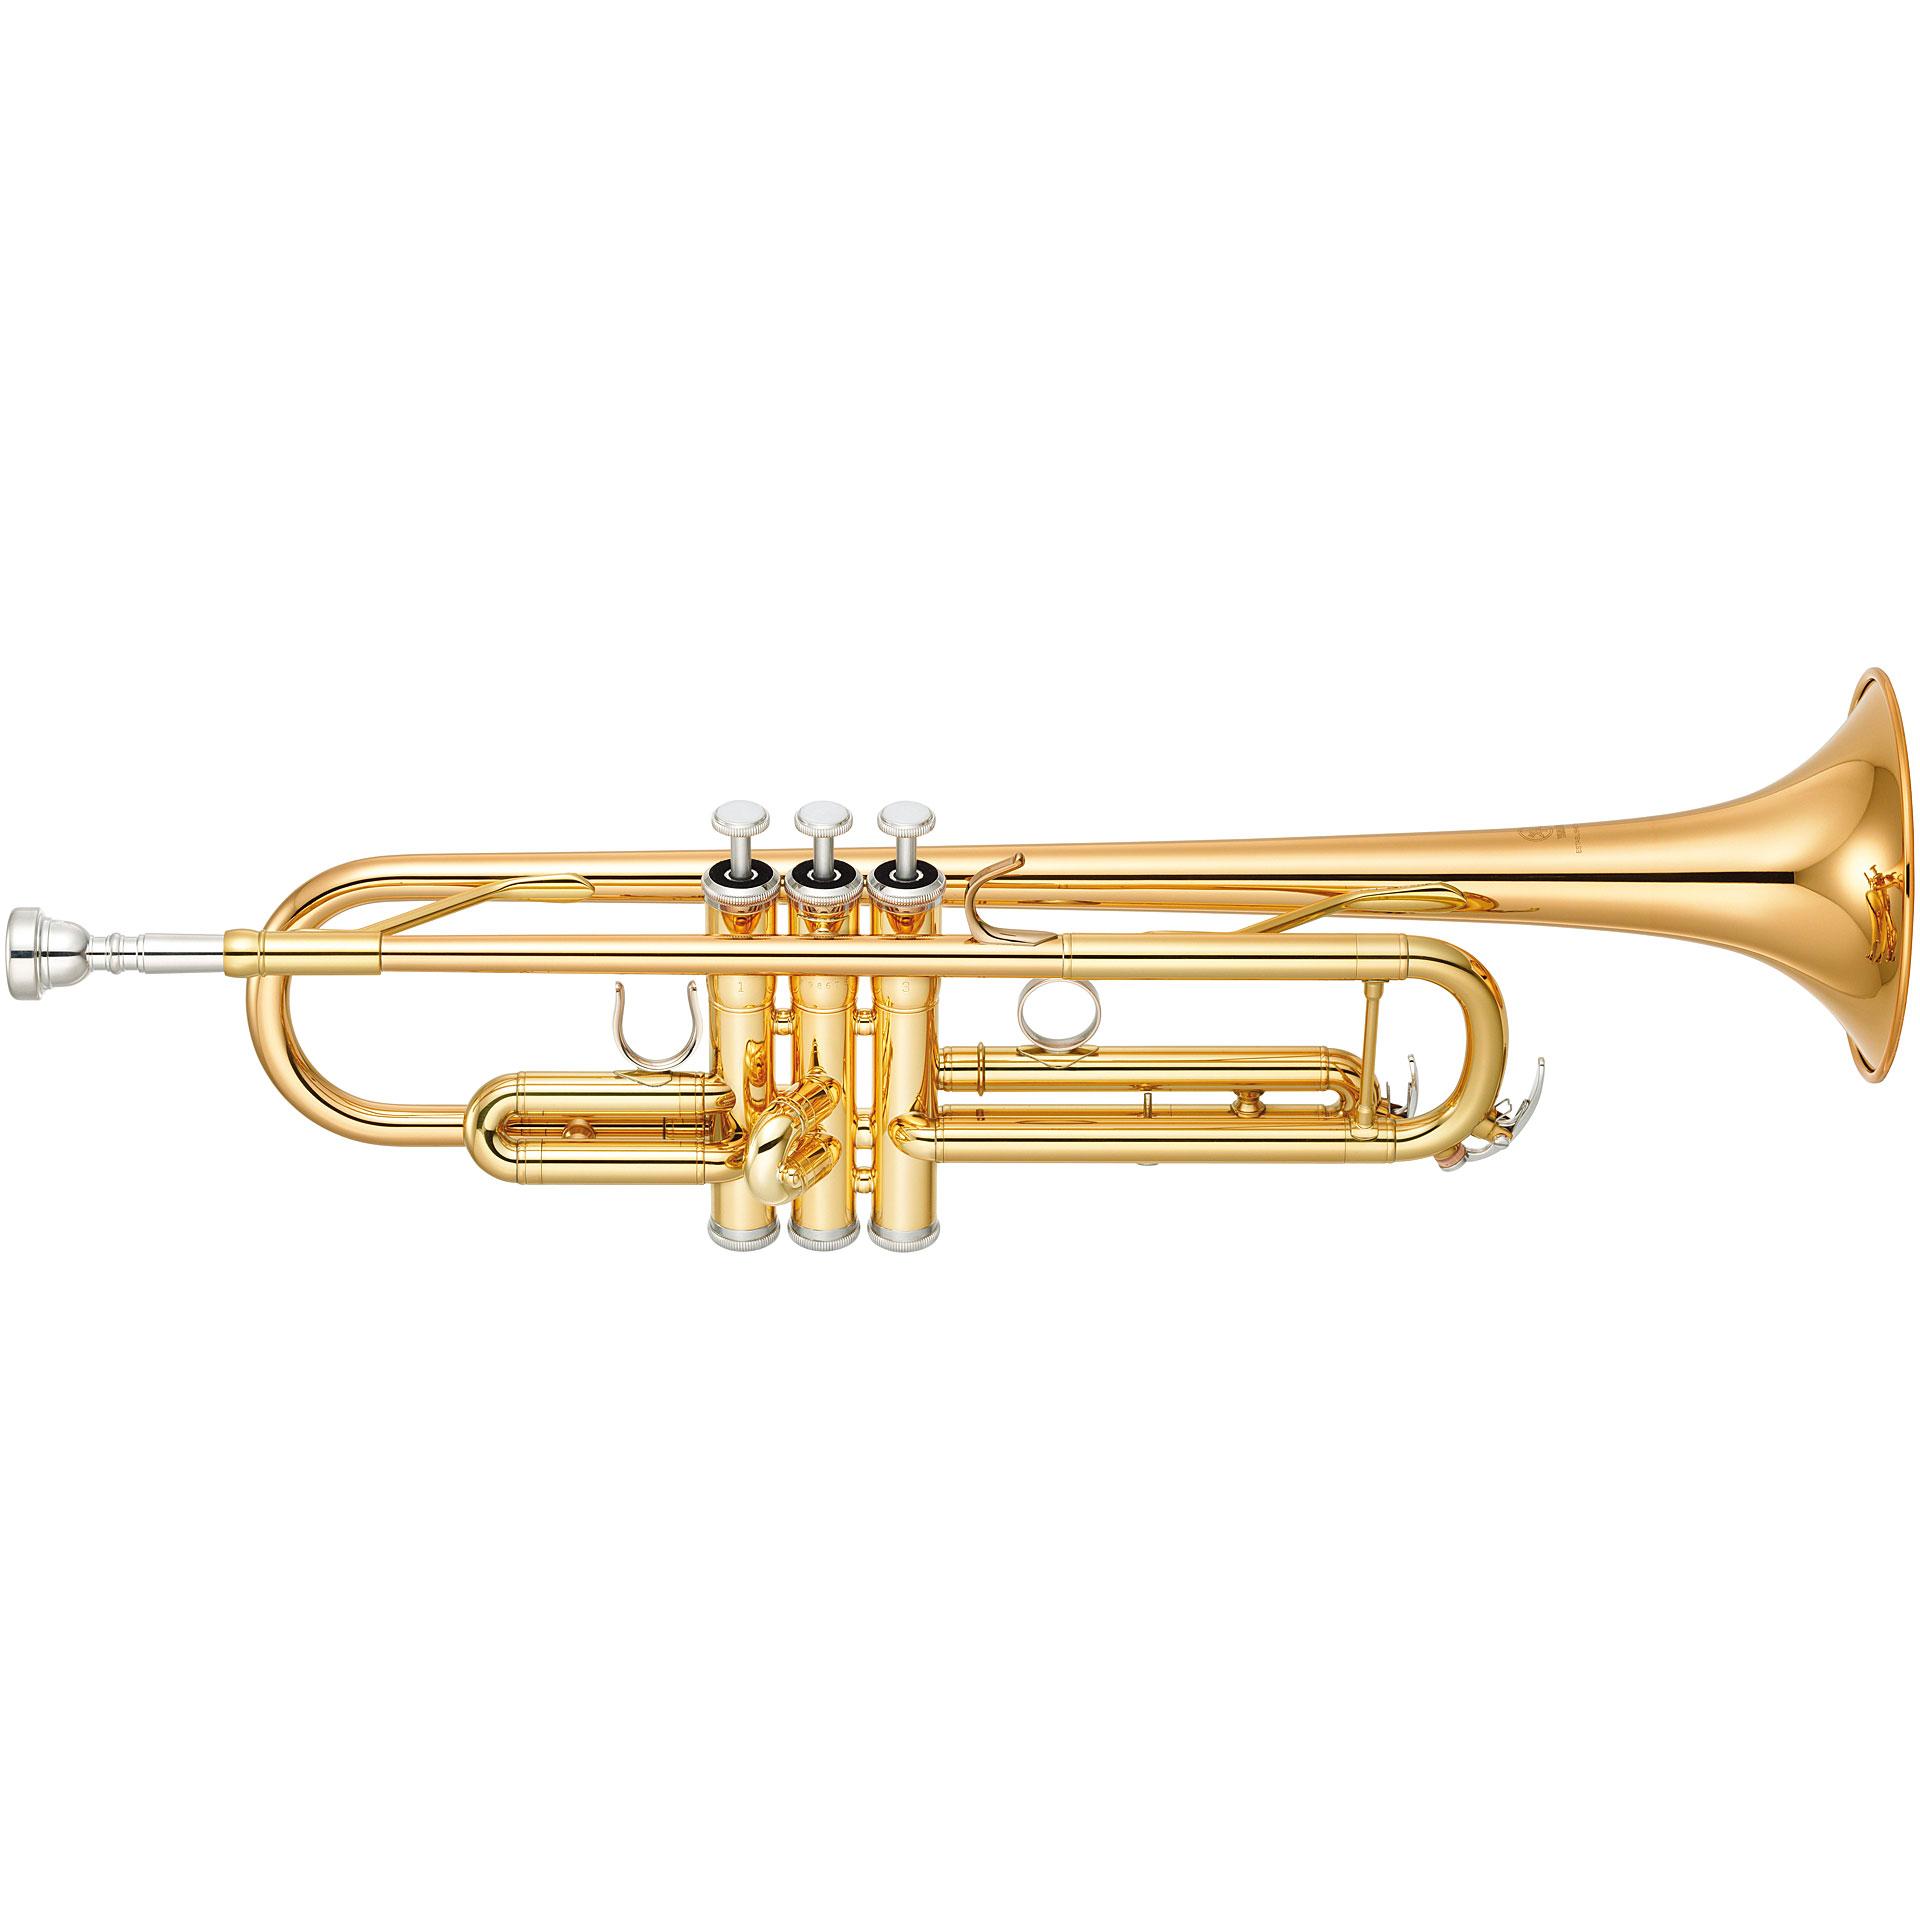 yamaha ytr 4335 gii perinet trumpet